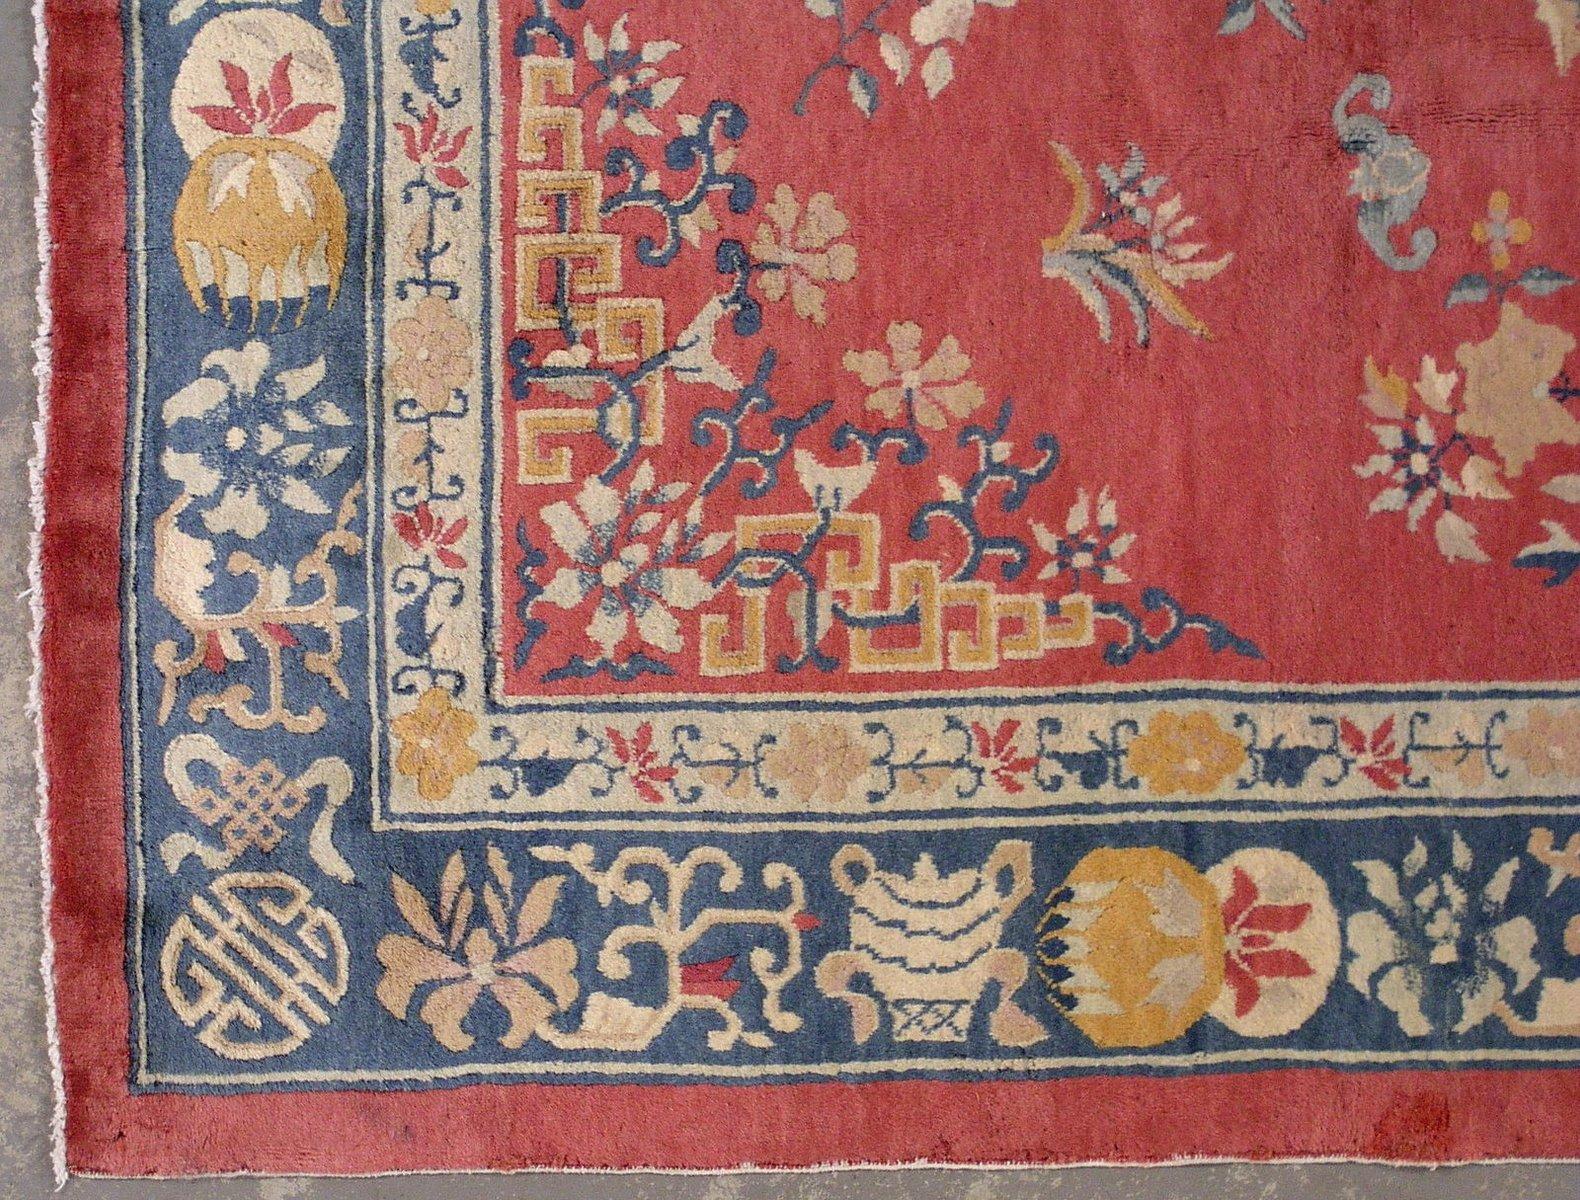 Handgekn pfter chinesischer art deco teppich 1930er bei - Art deco teppich ...